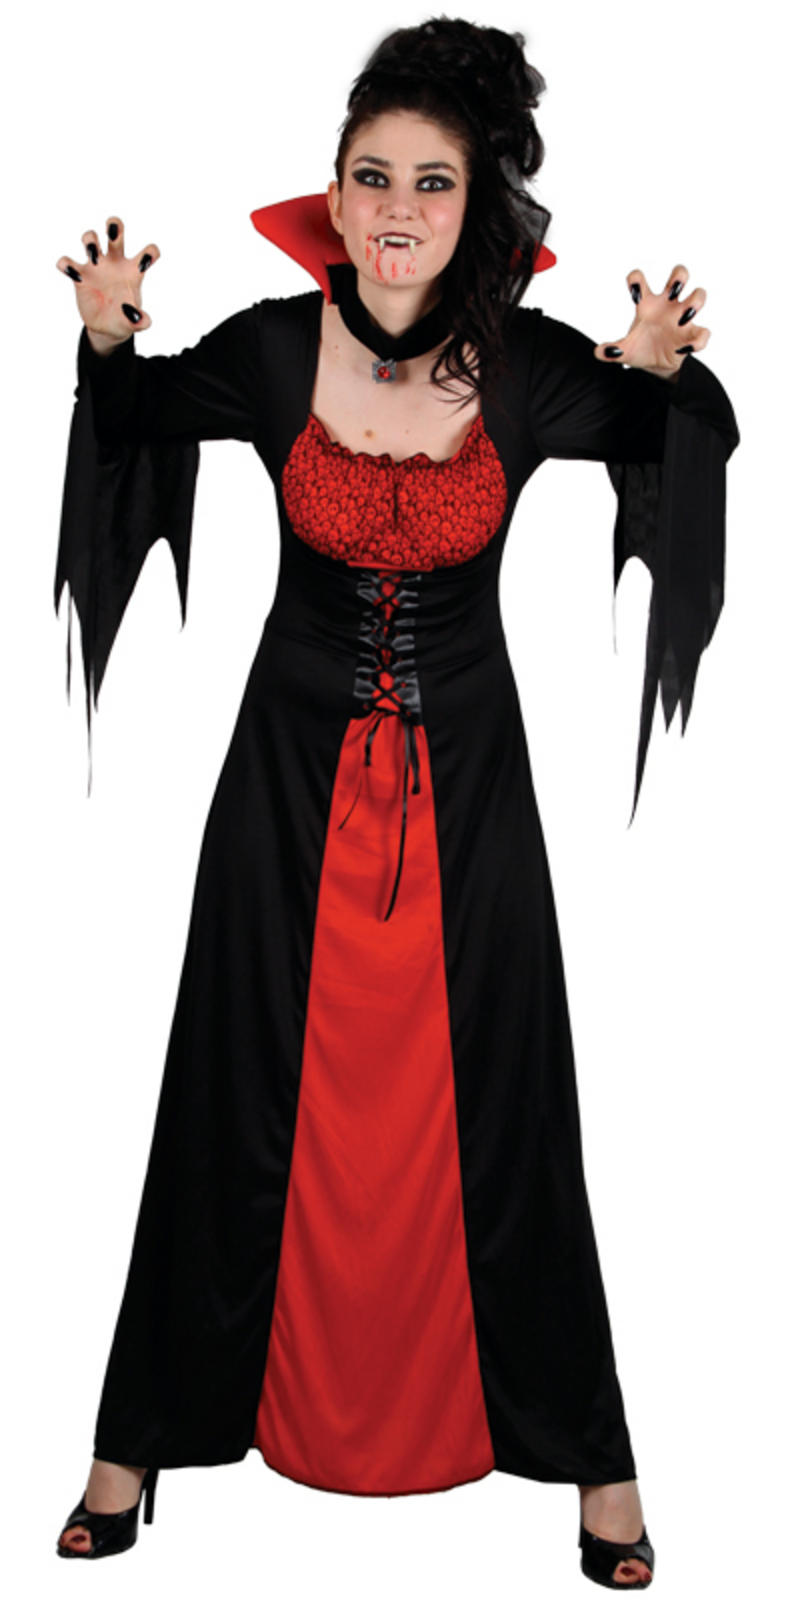 vampir blutsauger halloween party horror verkleidung f r. Black Bedroom Furniture Sets. Home Design Ideas